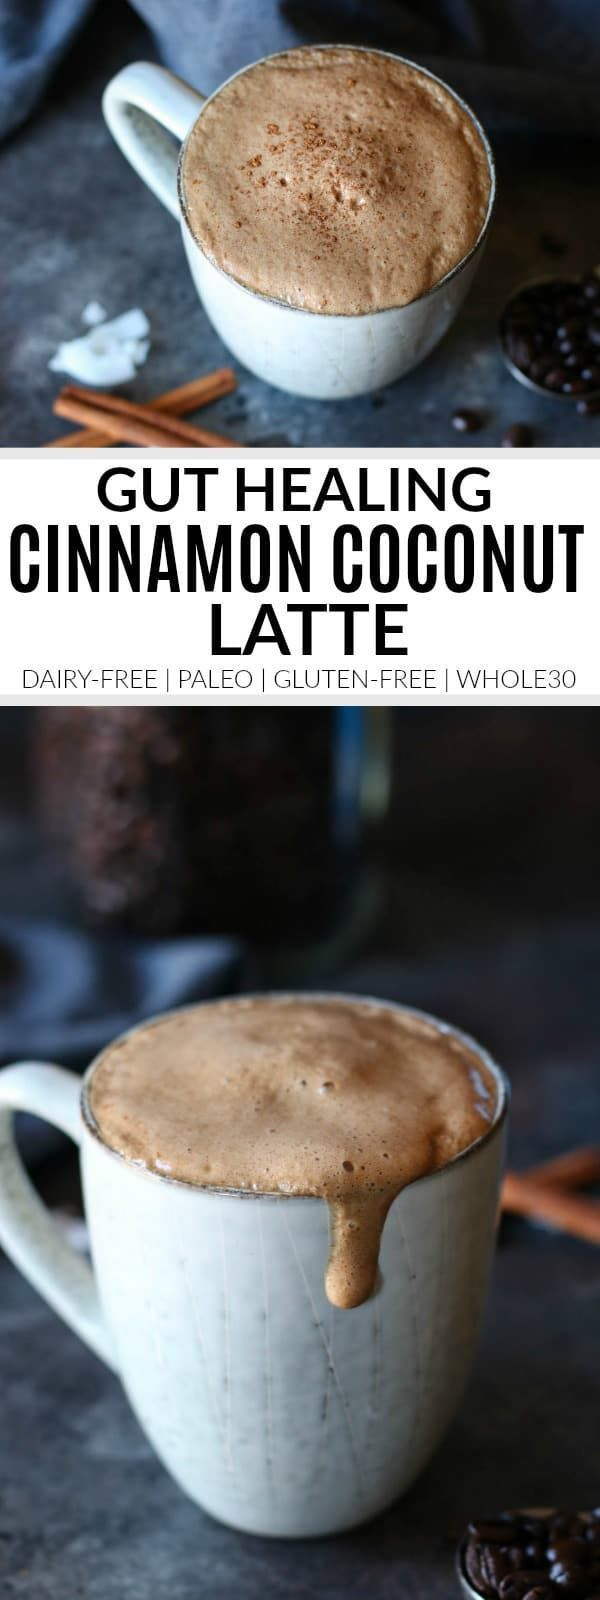 Cinnamon Coconut Latte -